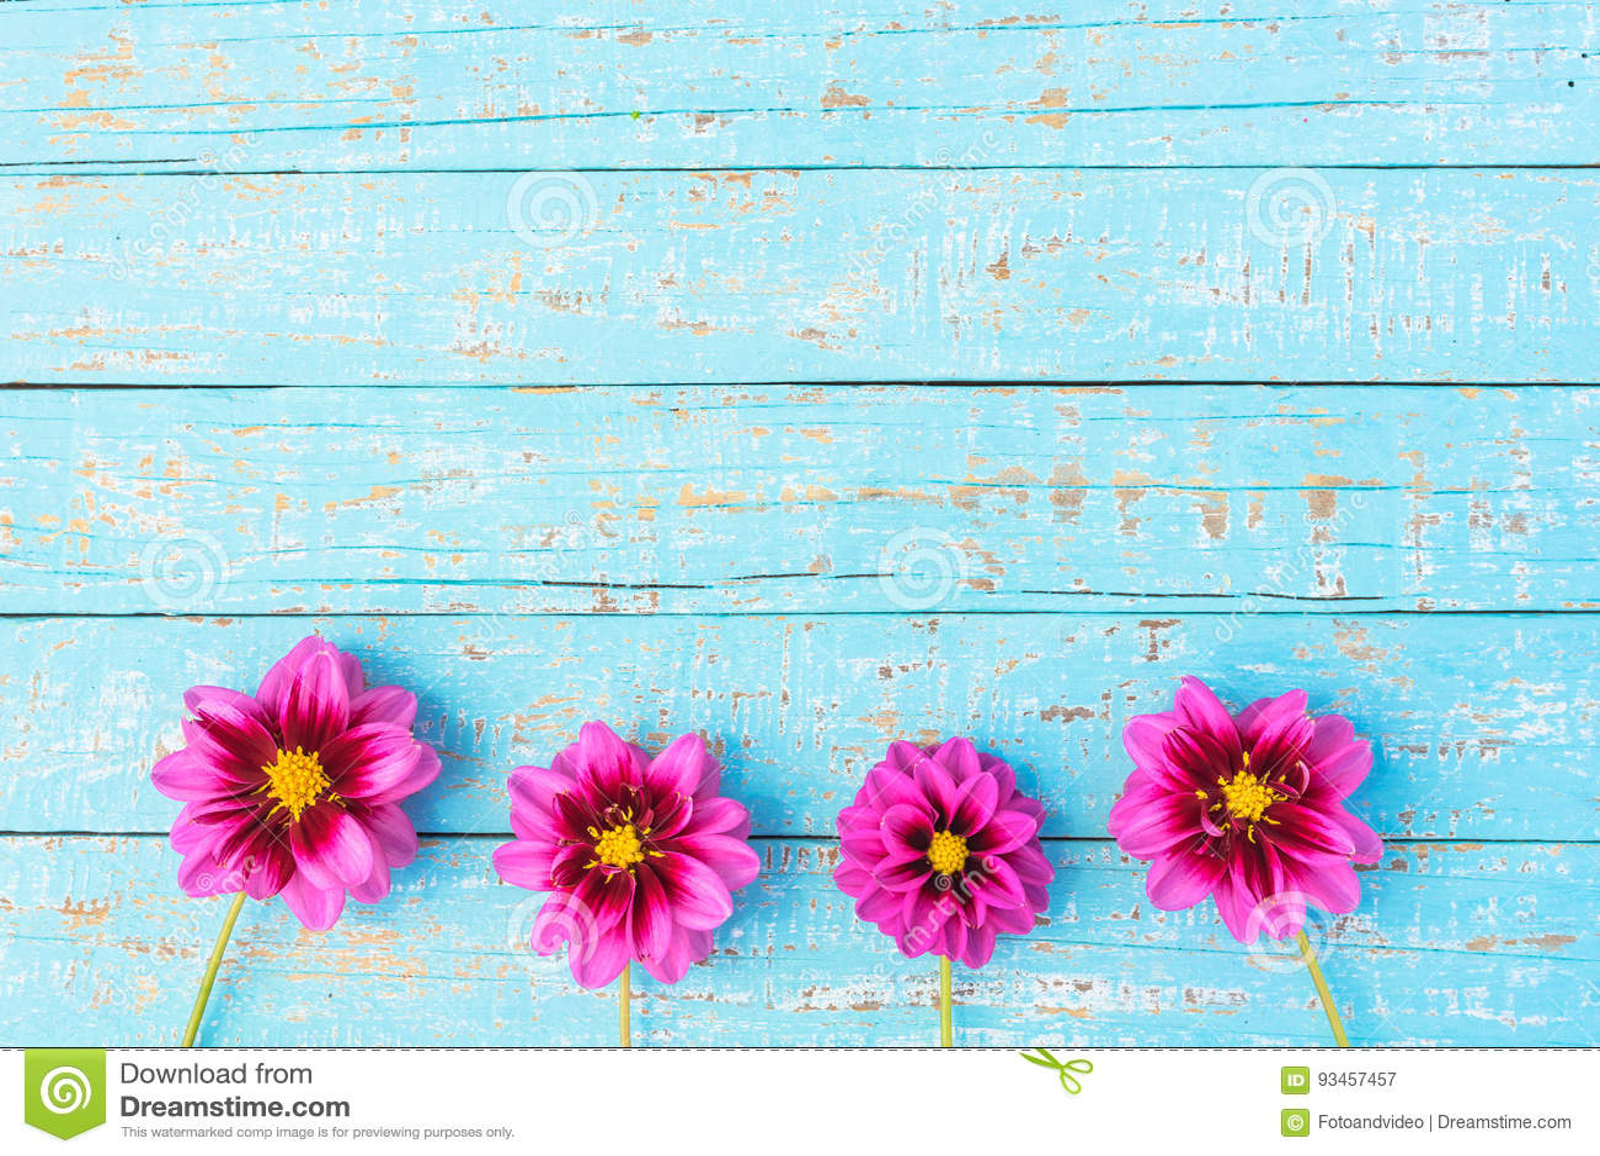 Beautiful Pink Flowers Border On Light Blue Background Stock Image